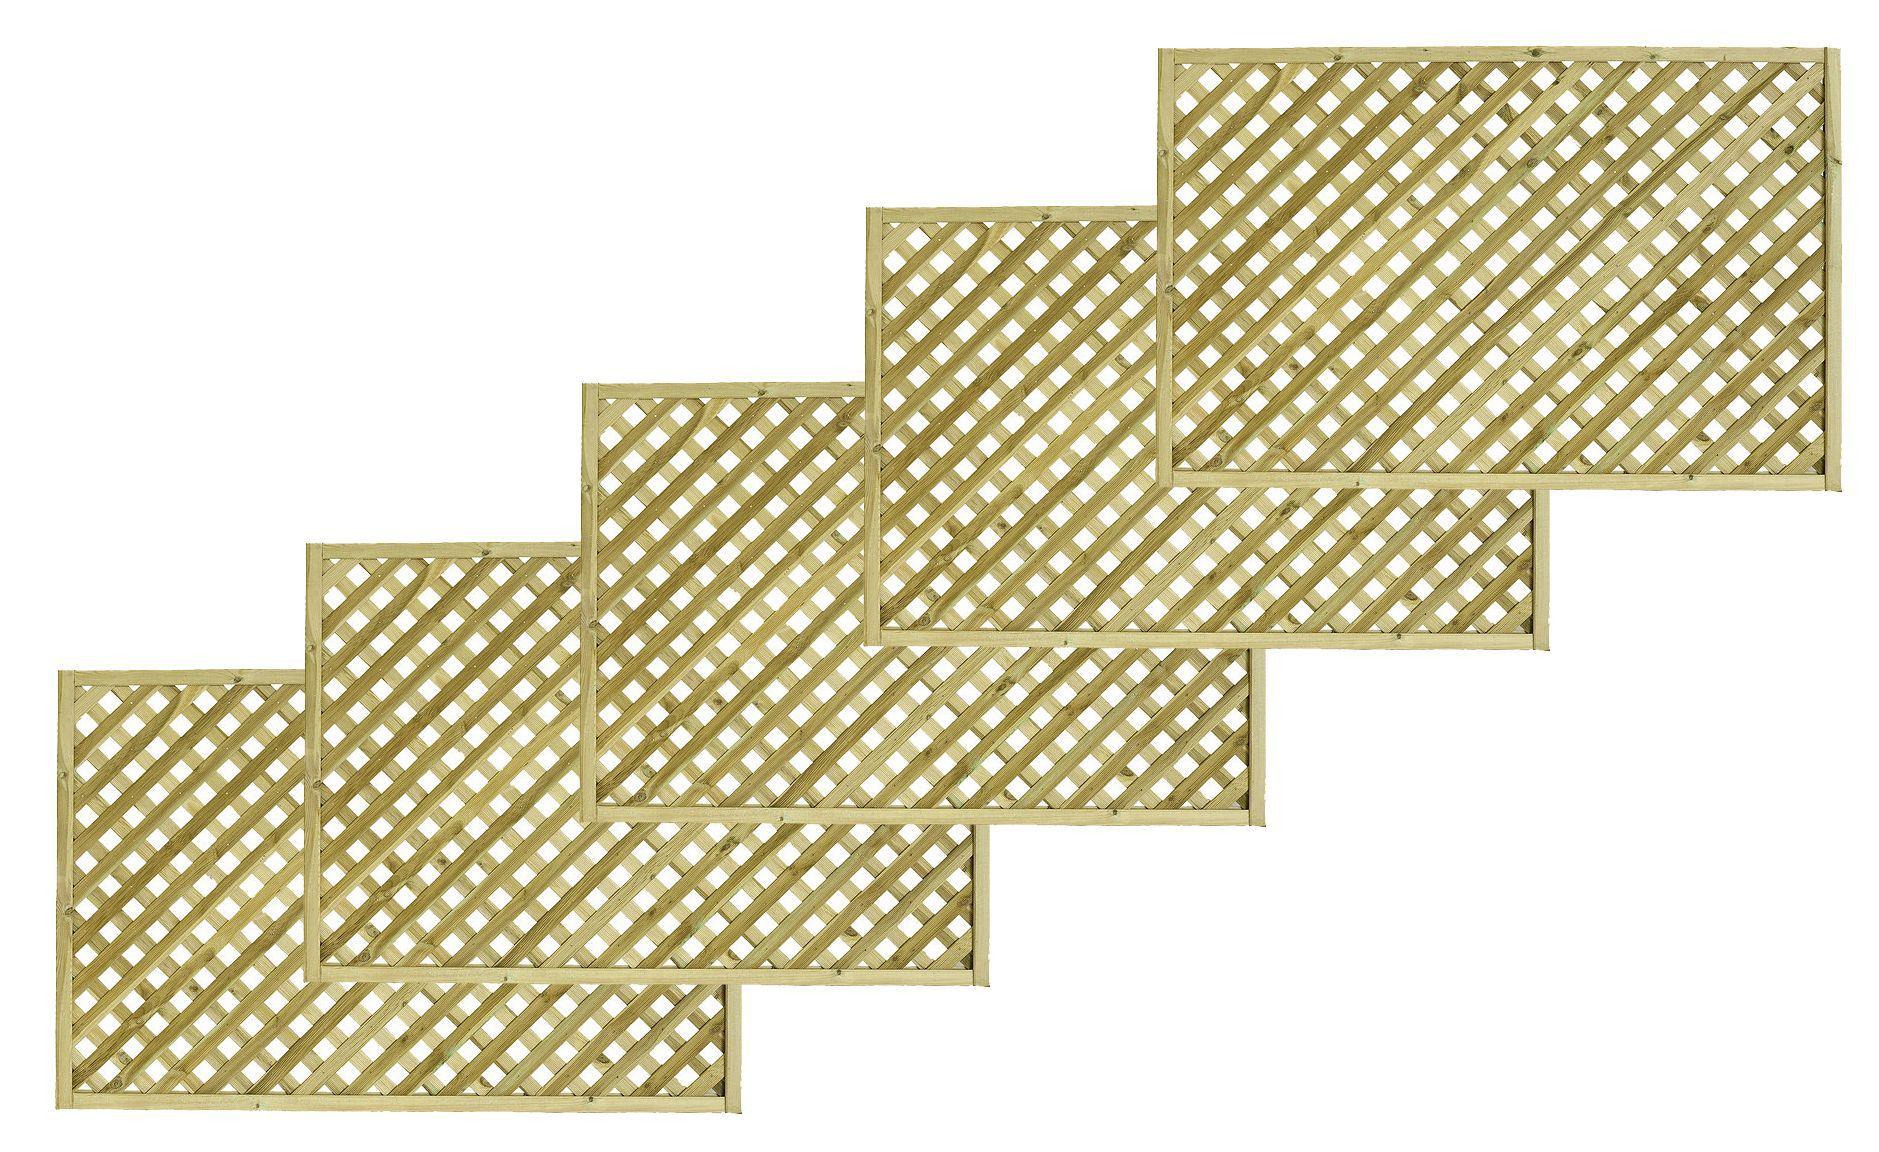 Woodbury Timber Square Trellis Panel (h)1.8m(w)1.2 M, Pack Of 5